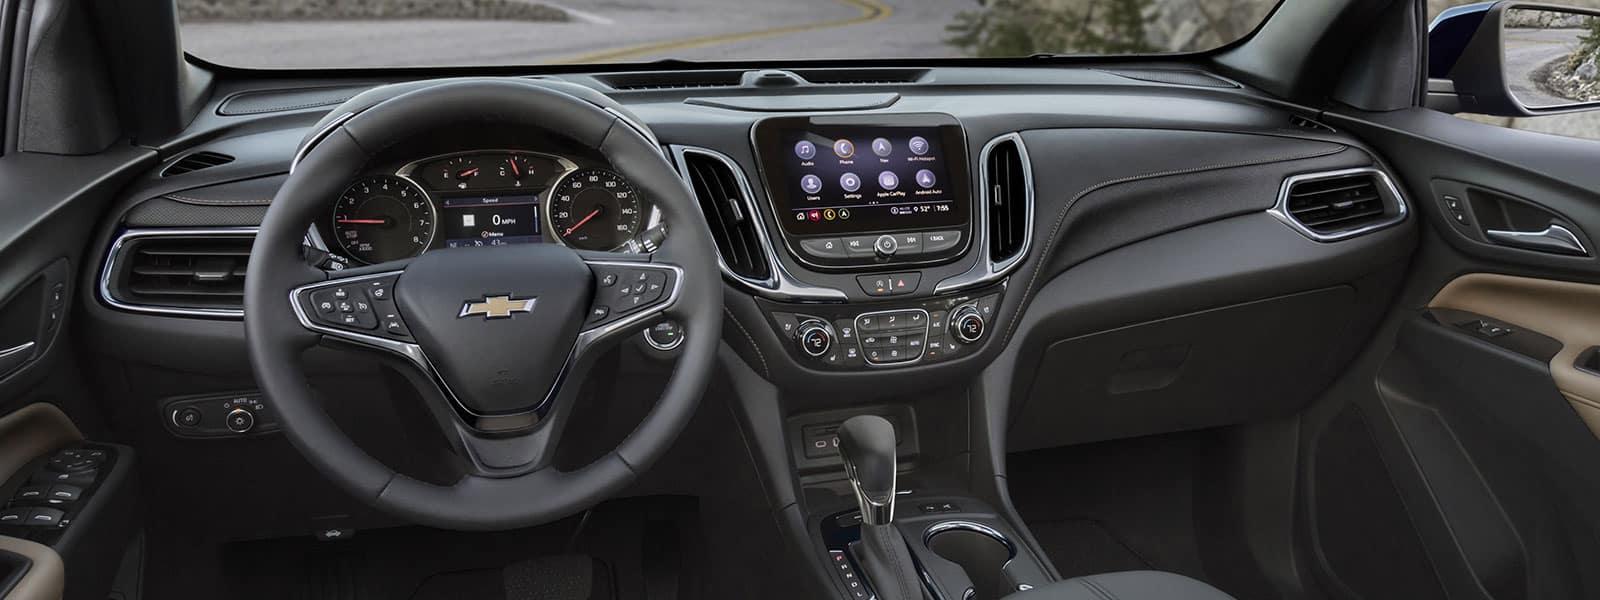 Lease or finance new 2022 Chevrolet Equinox in Regina SK